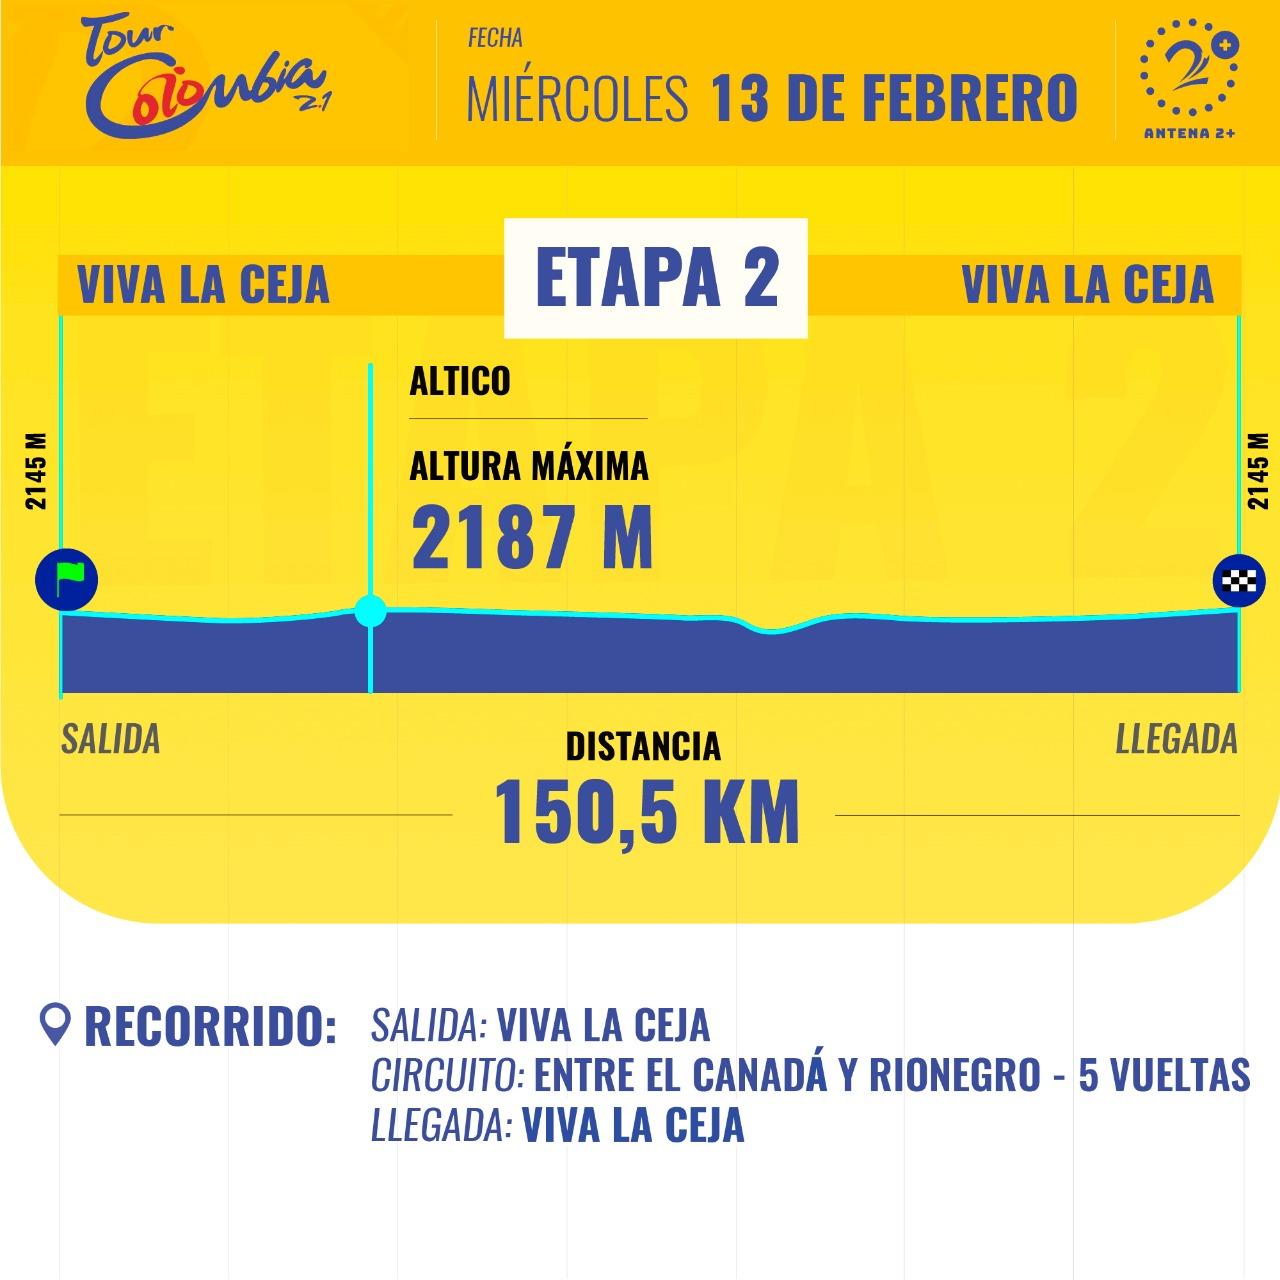 Tour Colombia 2.1 - Segunda etapa